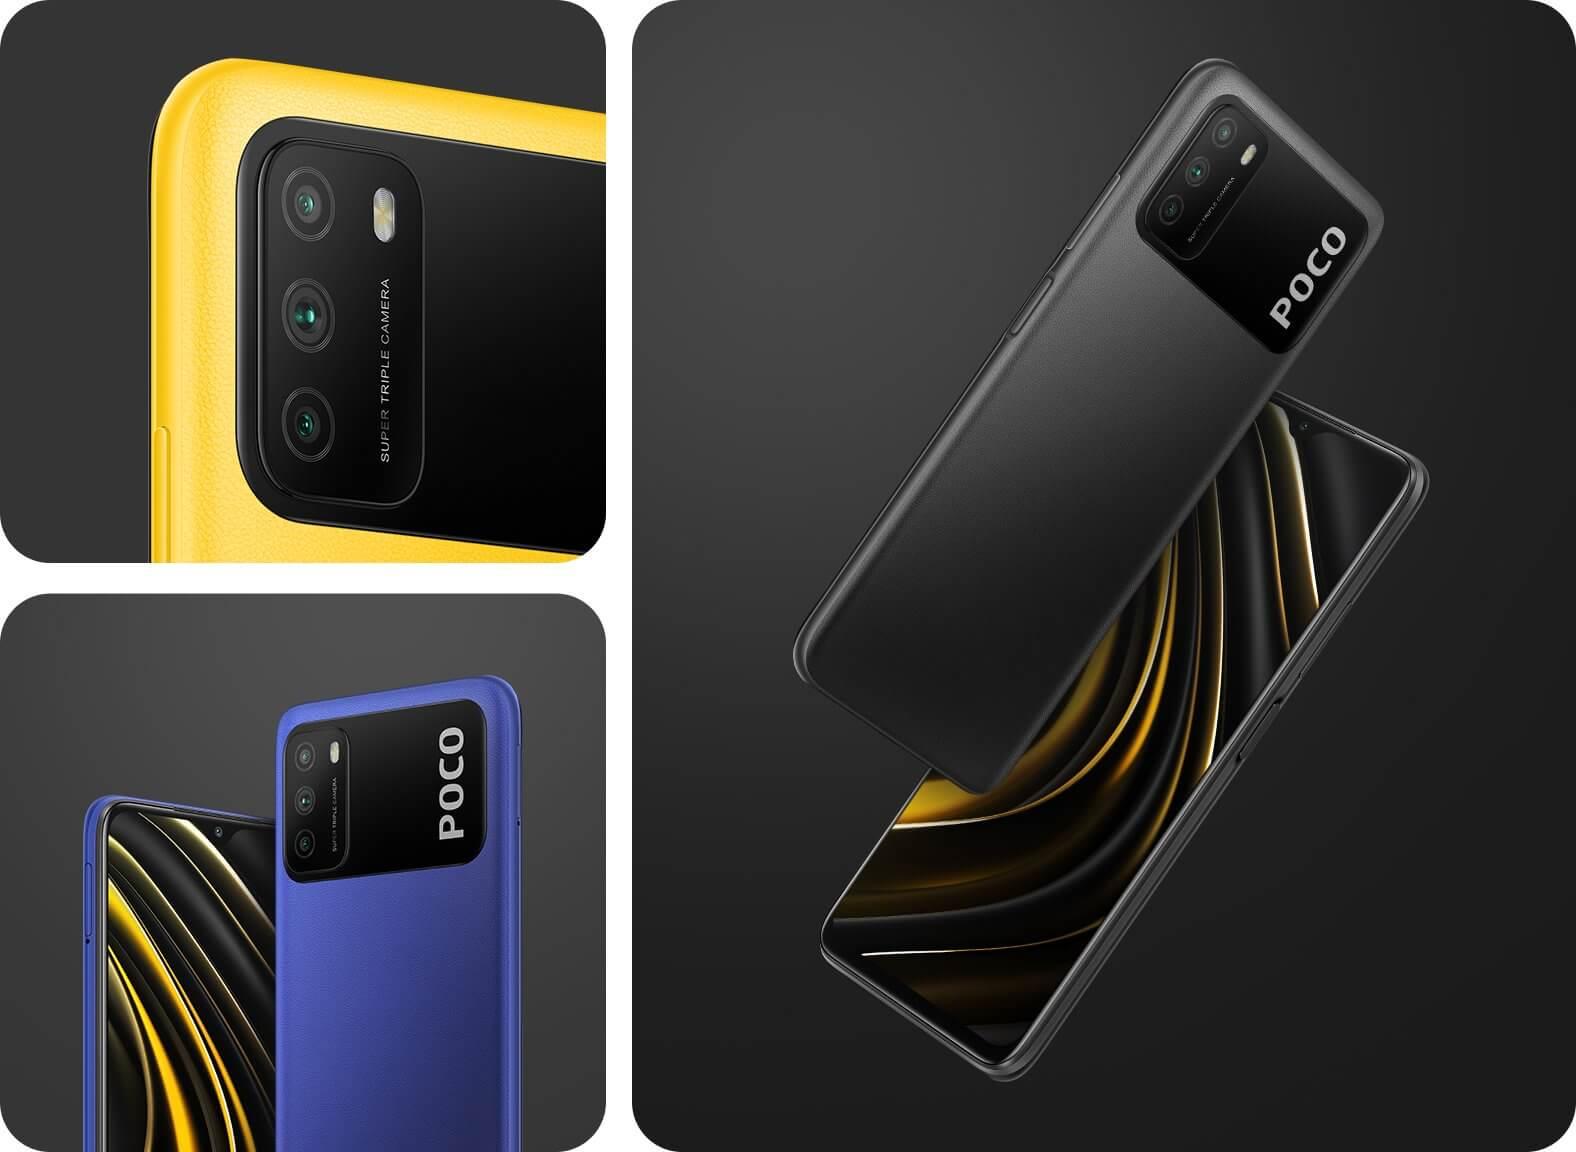 Xiaomi представила Poco M3 с батареей на 6000 мАч в России